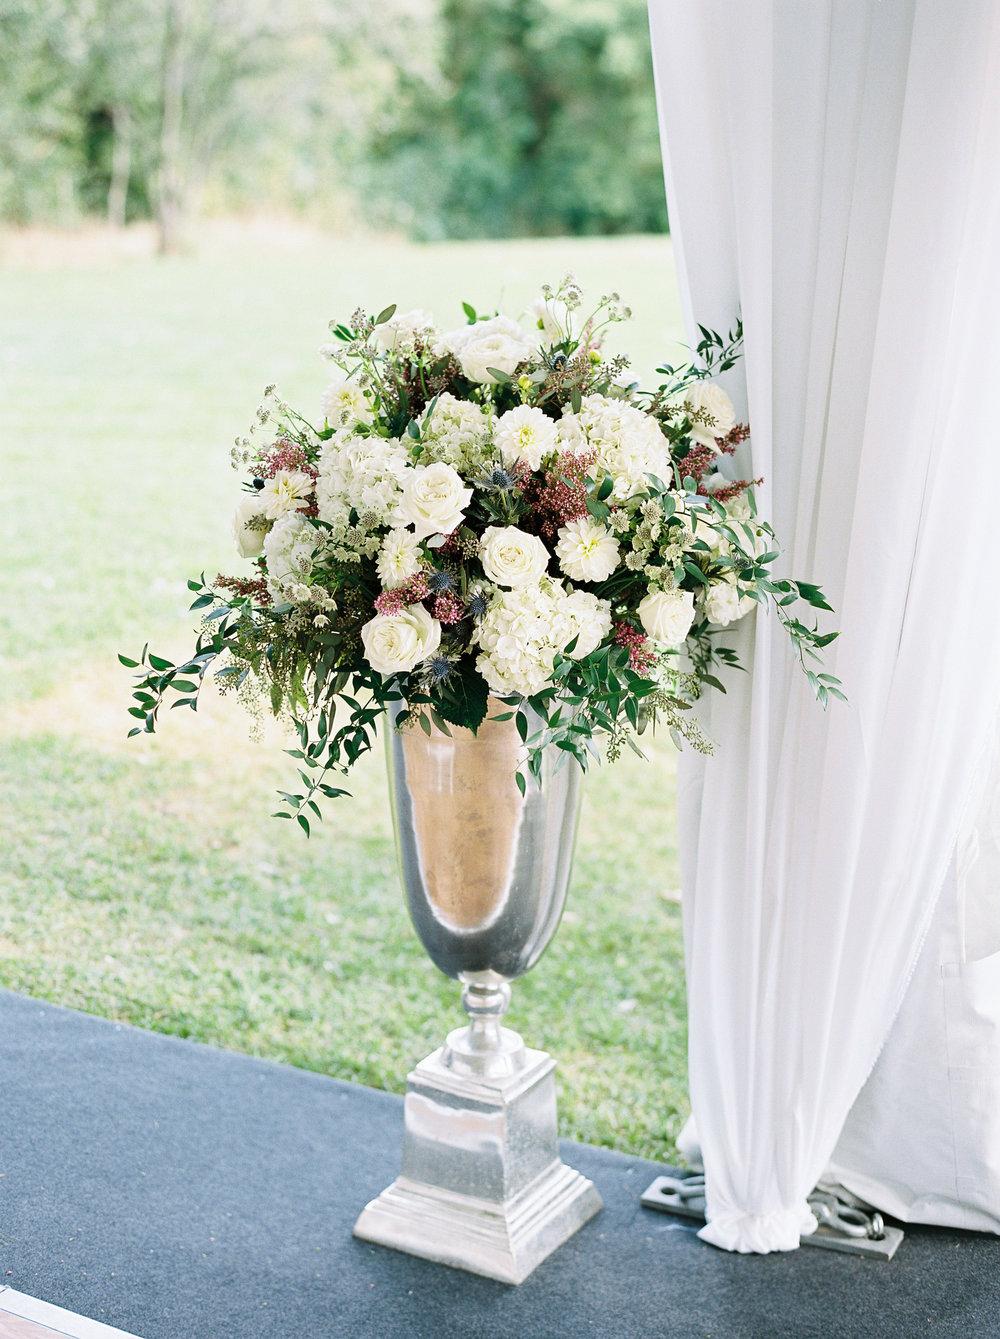 0306-Geneva-Ian-Wedding-Toronto Golf Club-When He Found Her-TorontoPhotographer.jpg